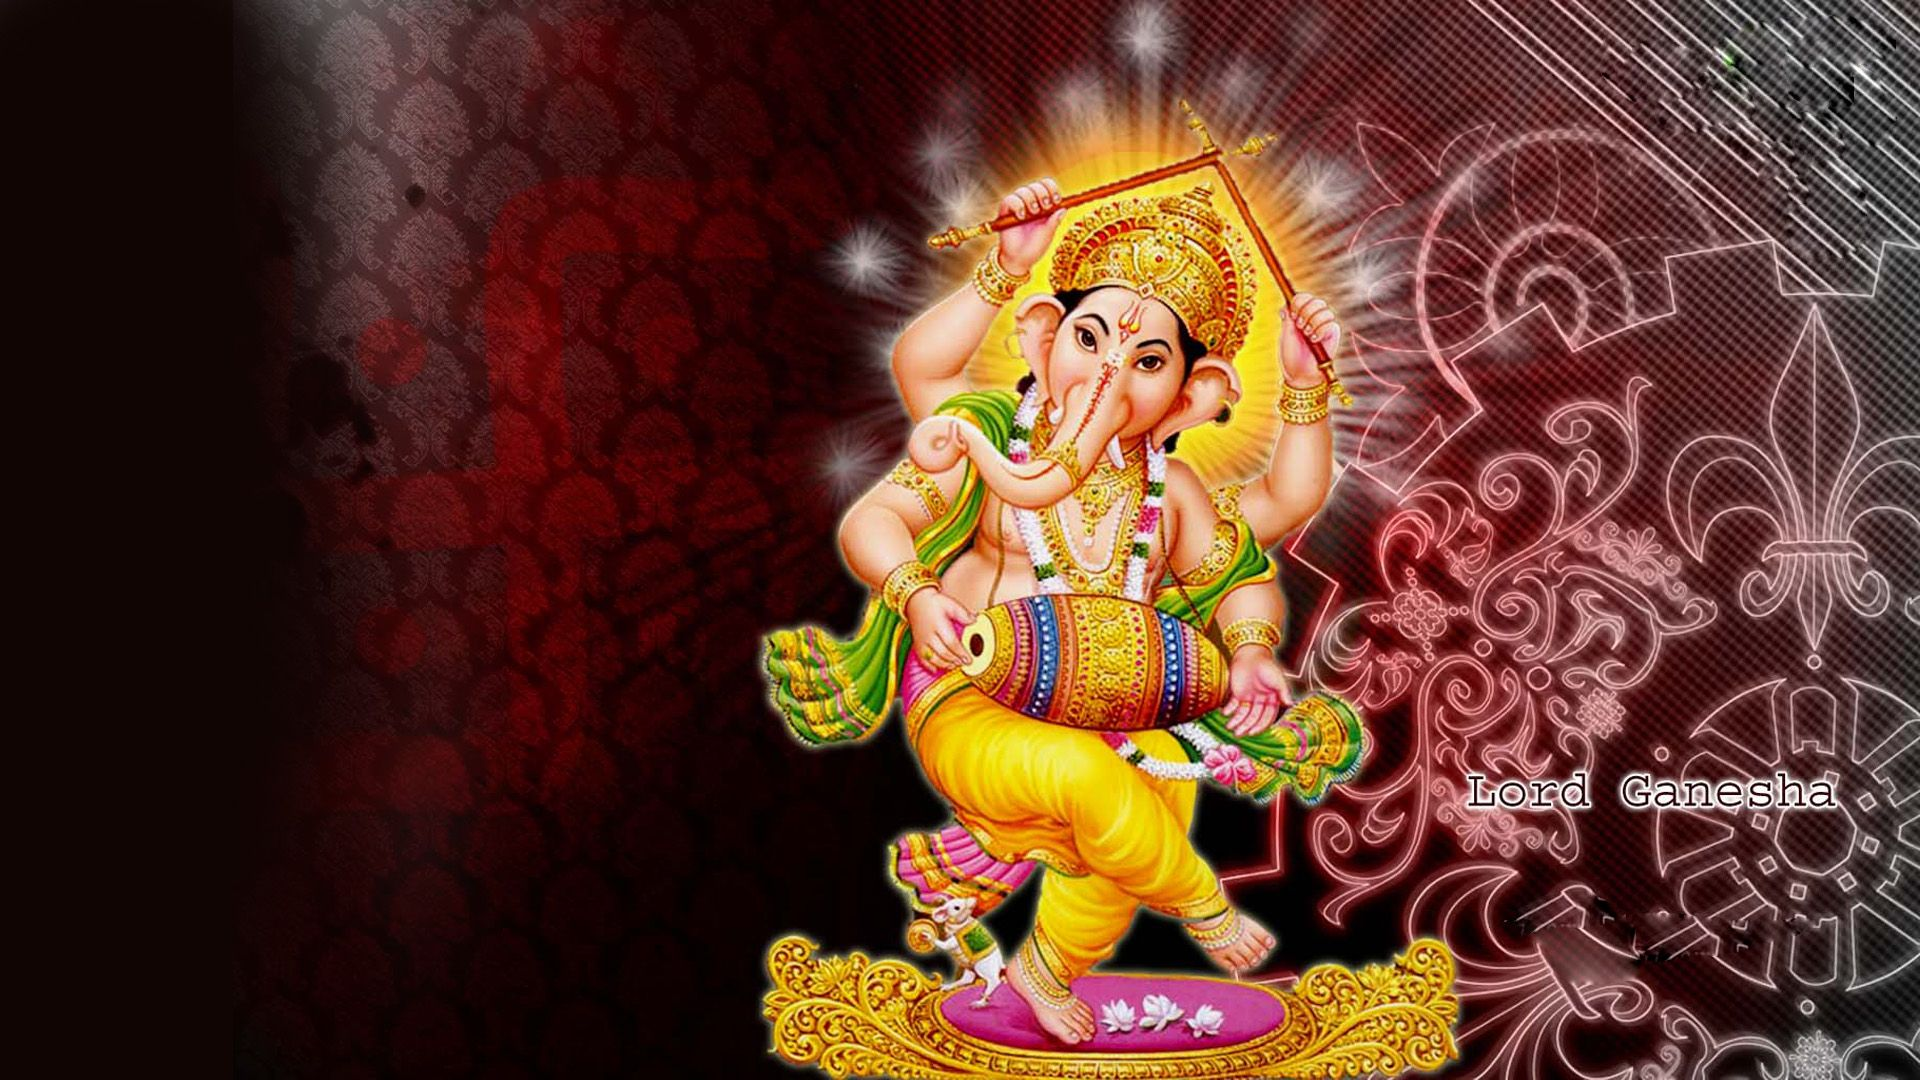 Hd wallpaper ganesh - Lord Ganesh Hd Wallpapers